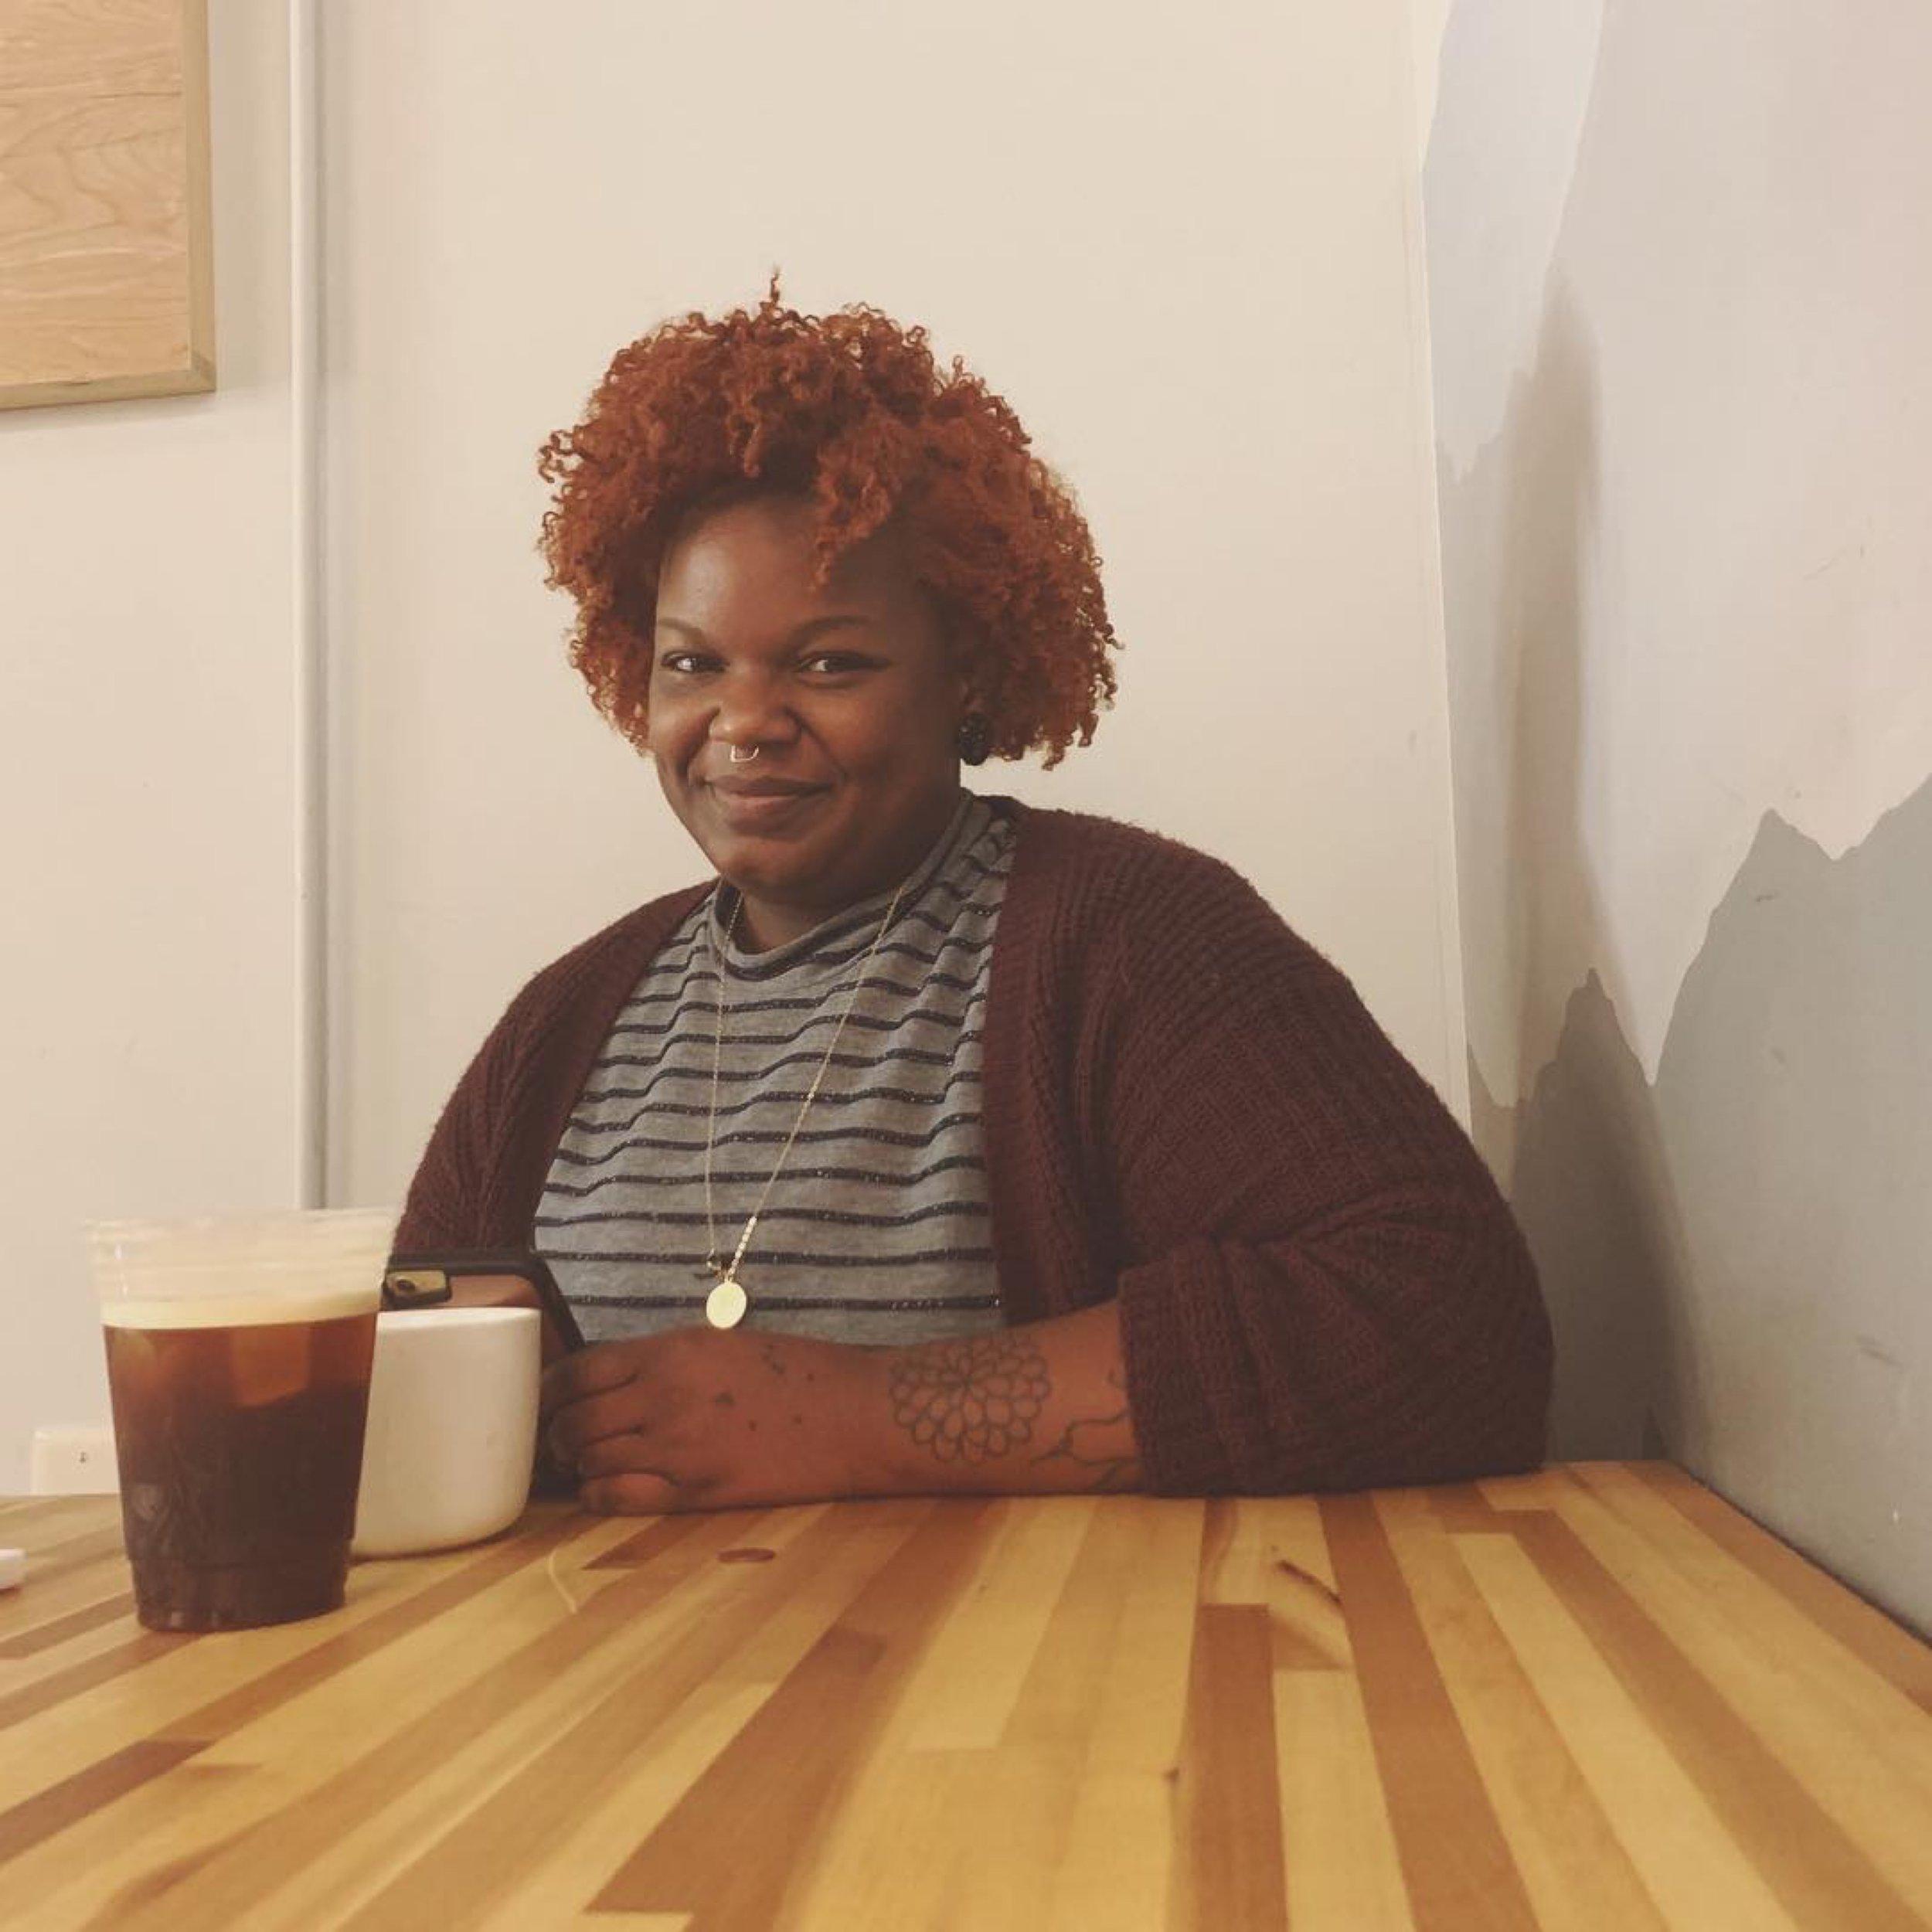 Cydni Patterson, Barista at Caffé Driade